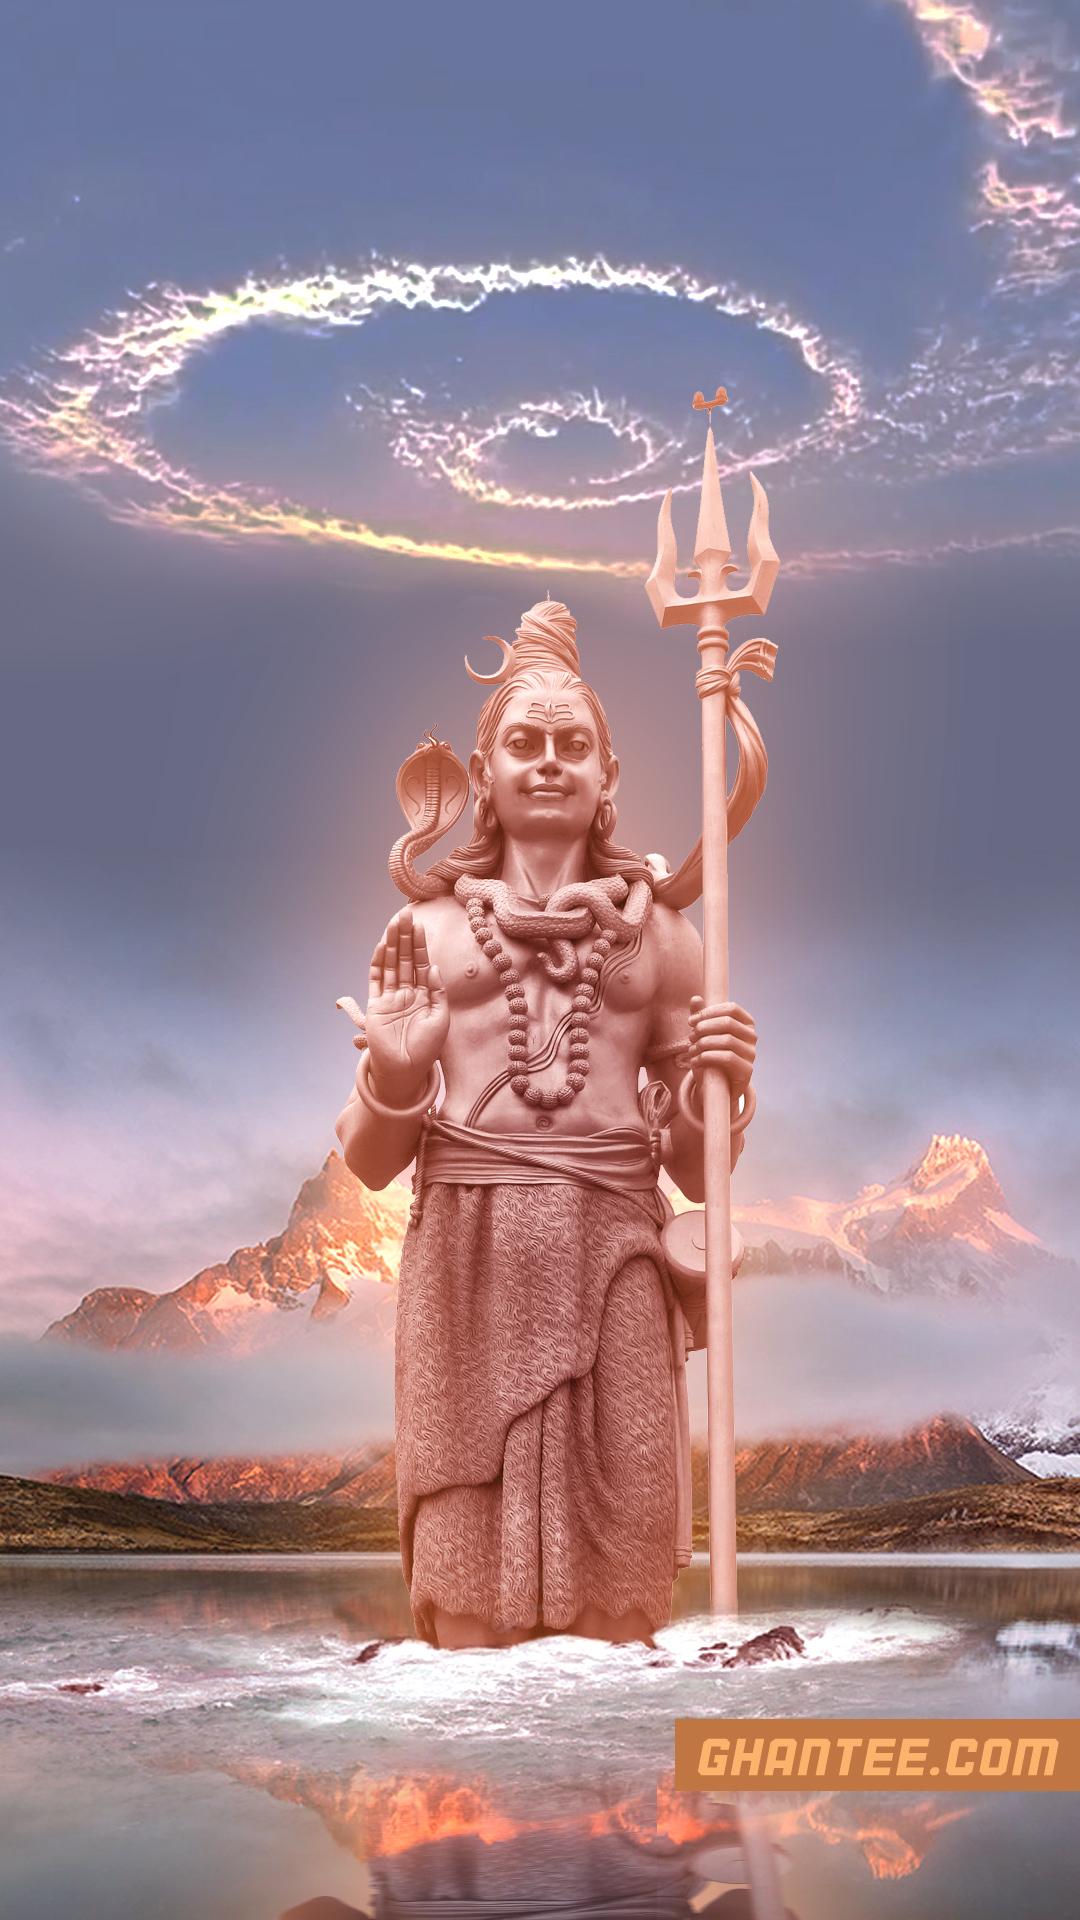 mahadev statue hd phone wallpaper | har har mahadev